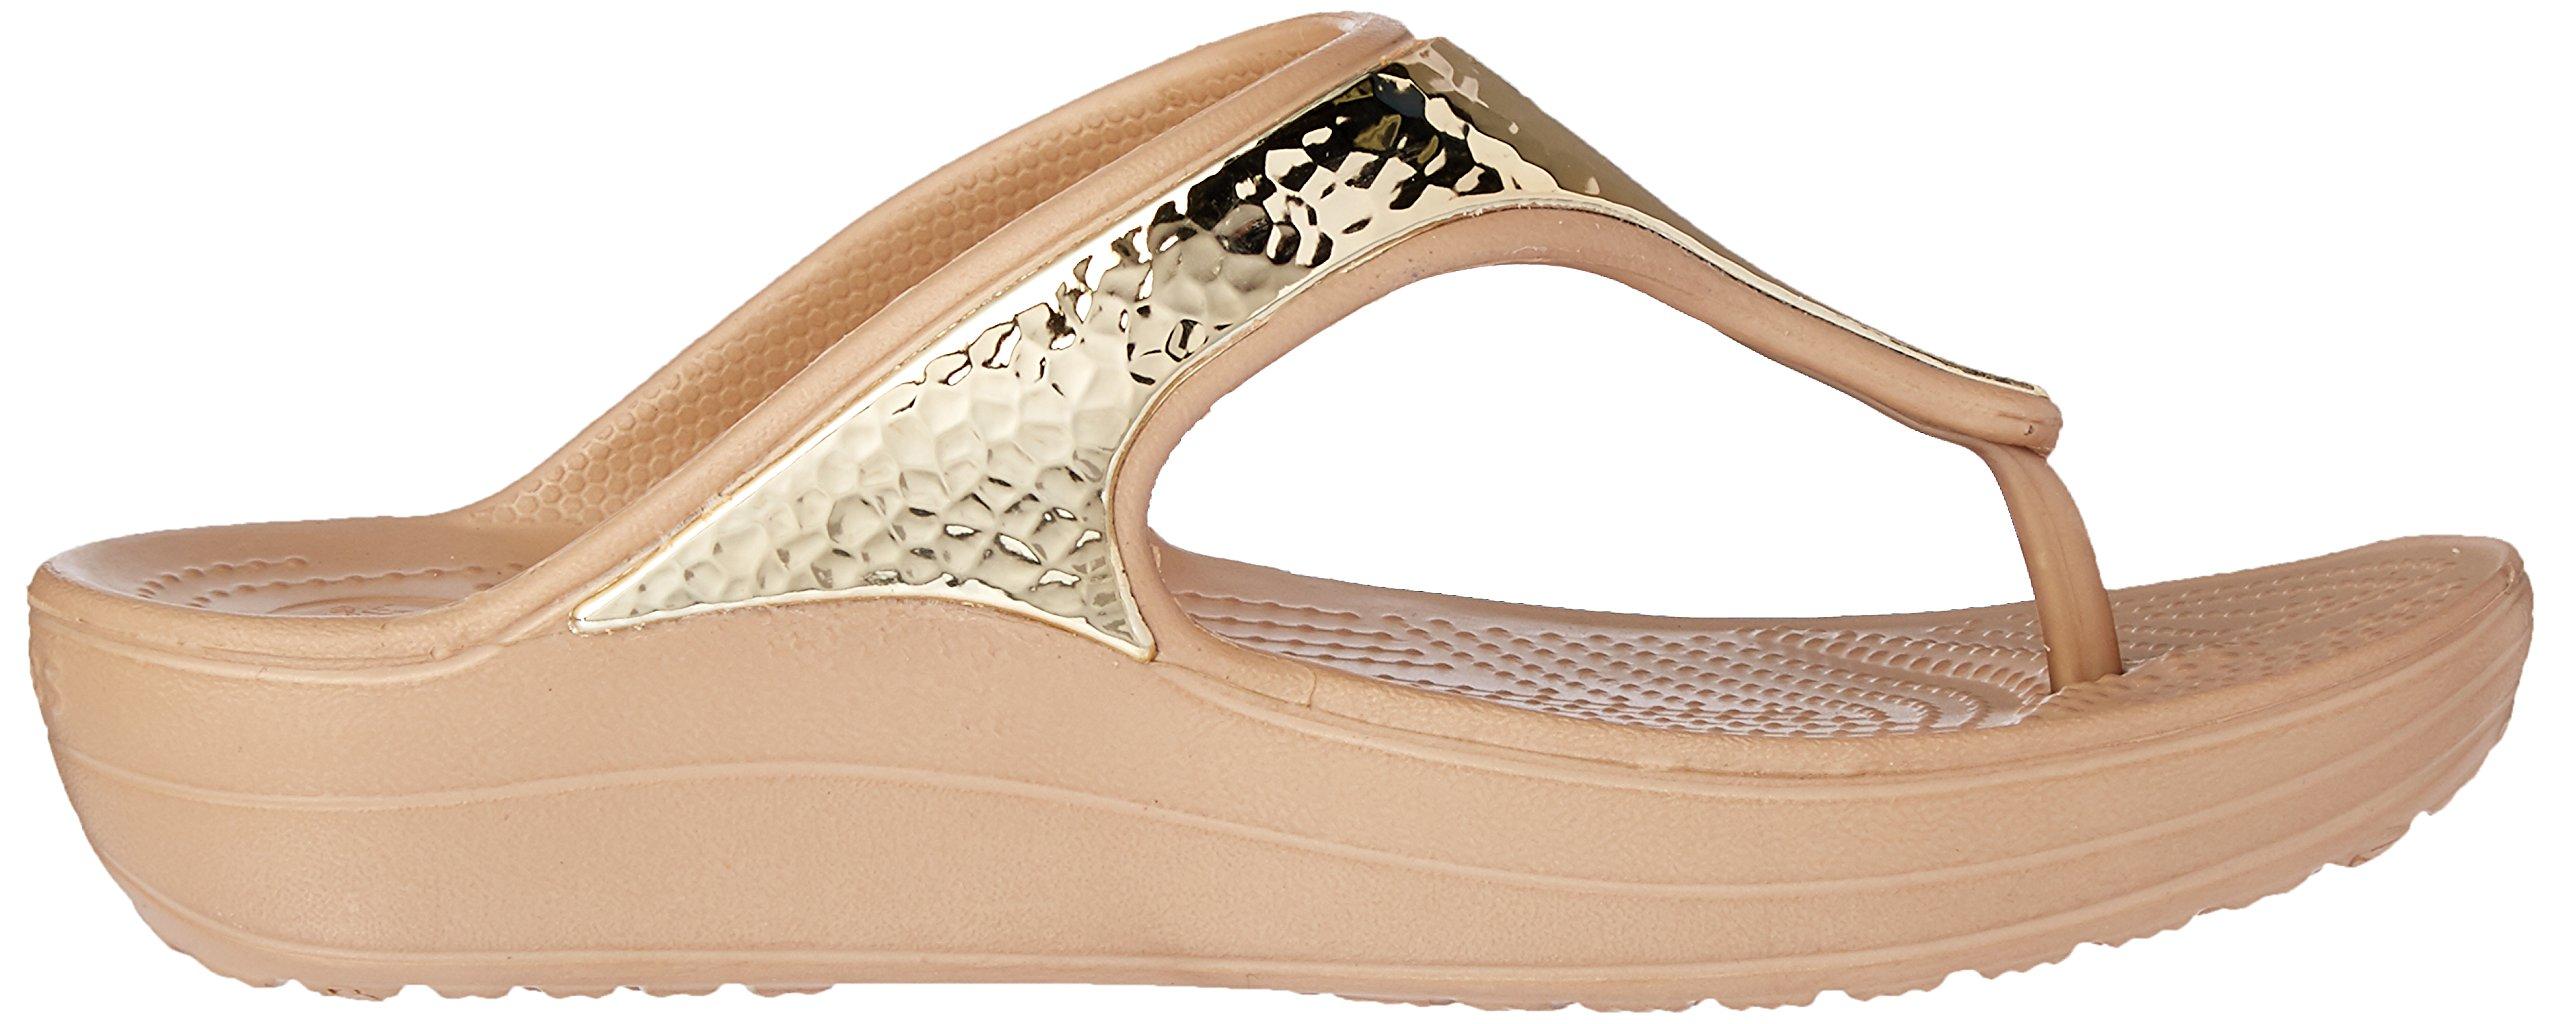 New Crocs Women/'s Sloane Embellished Flip Sandal 10 Gold Metallic 204181-797